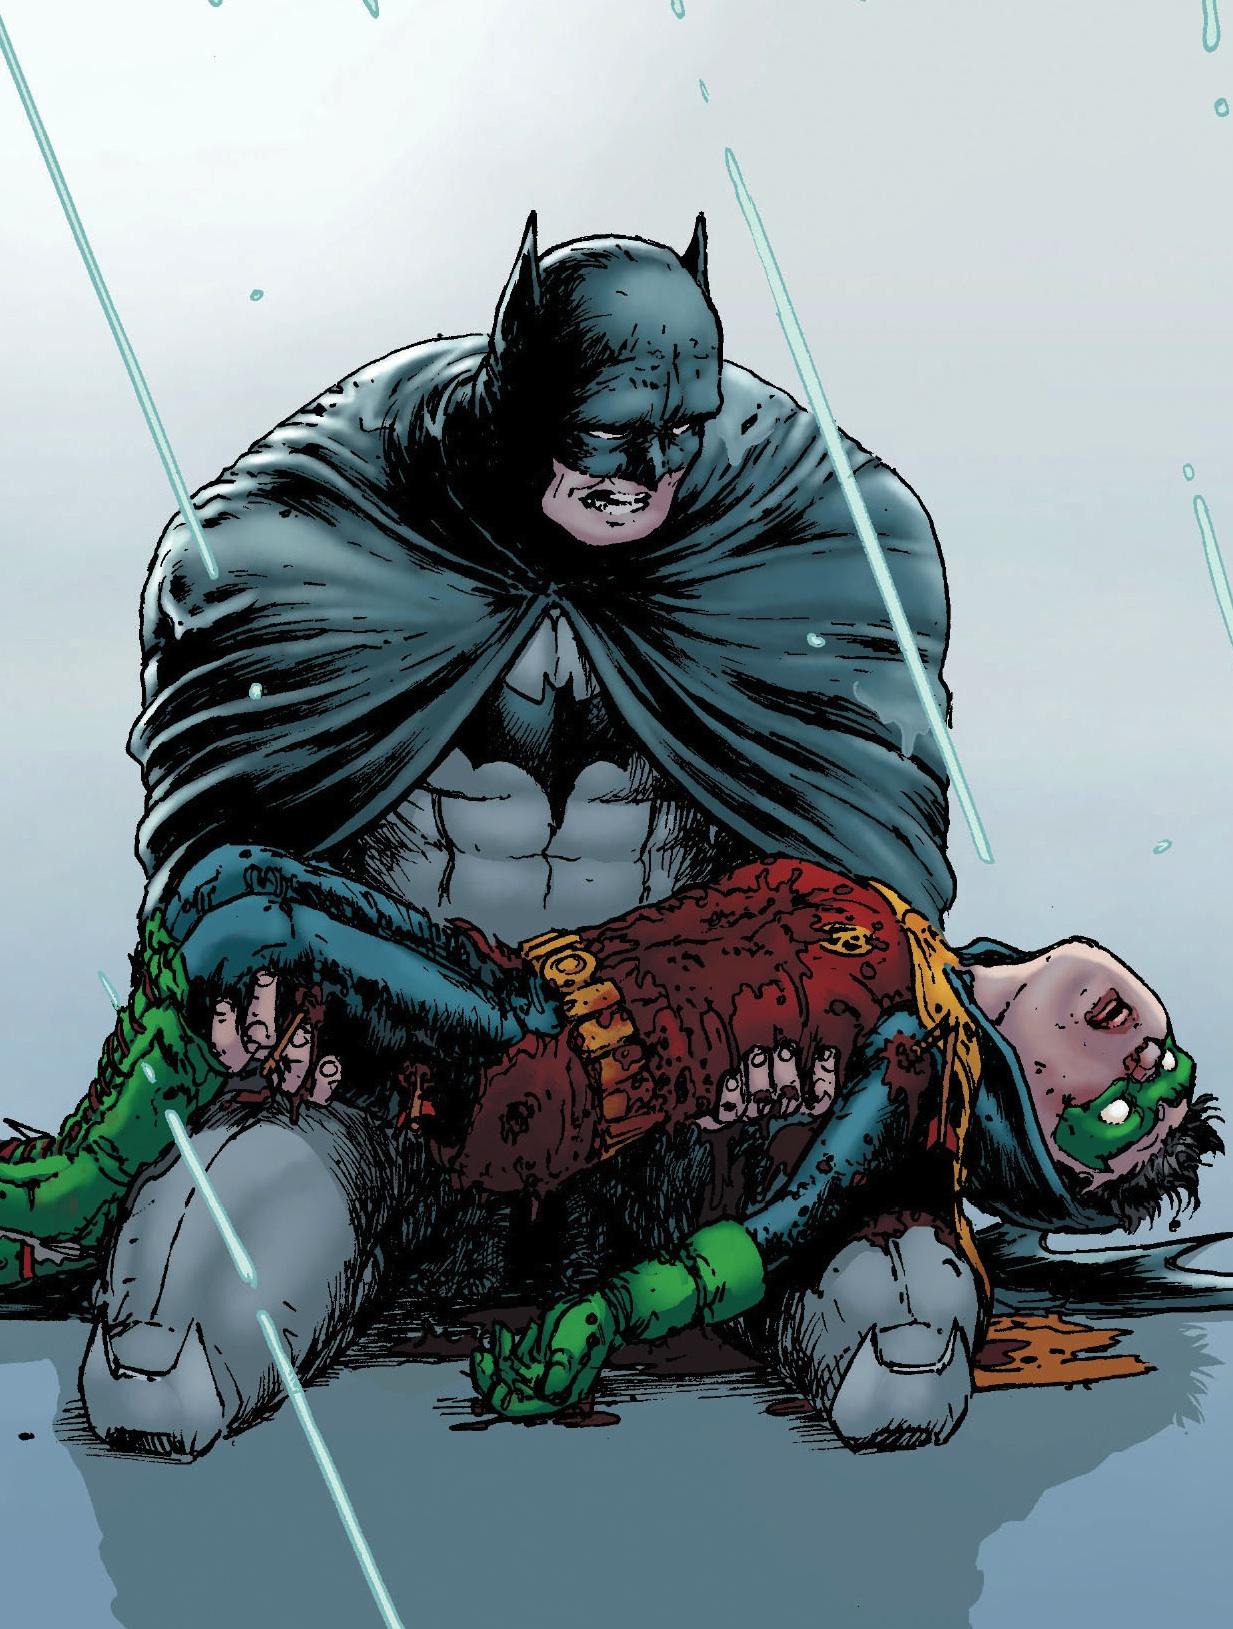 Top 9 sad comic moments. - Gen. Discussion - Comic Vine